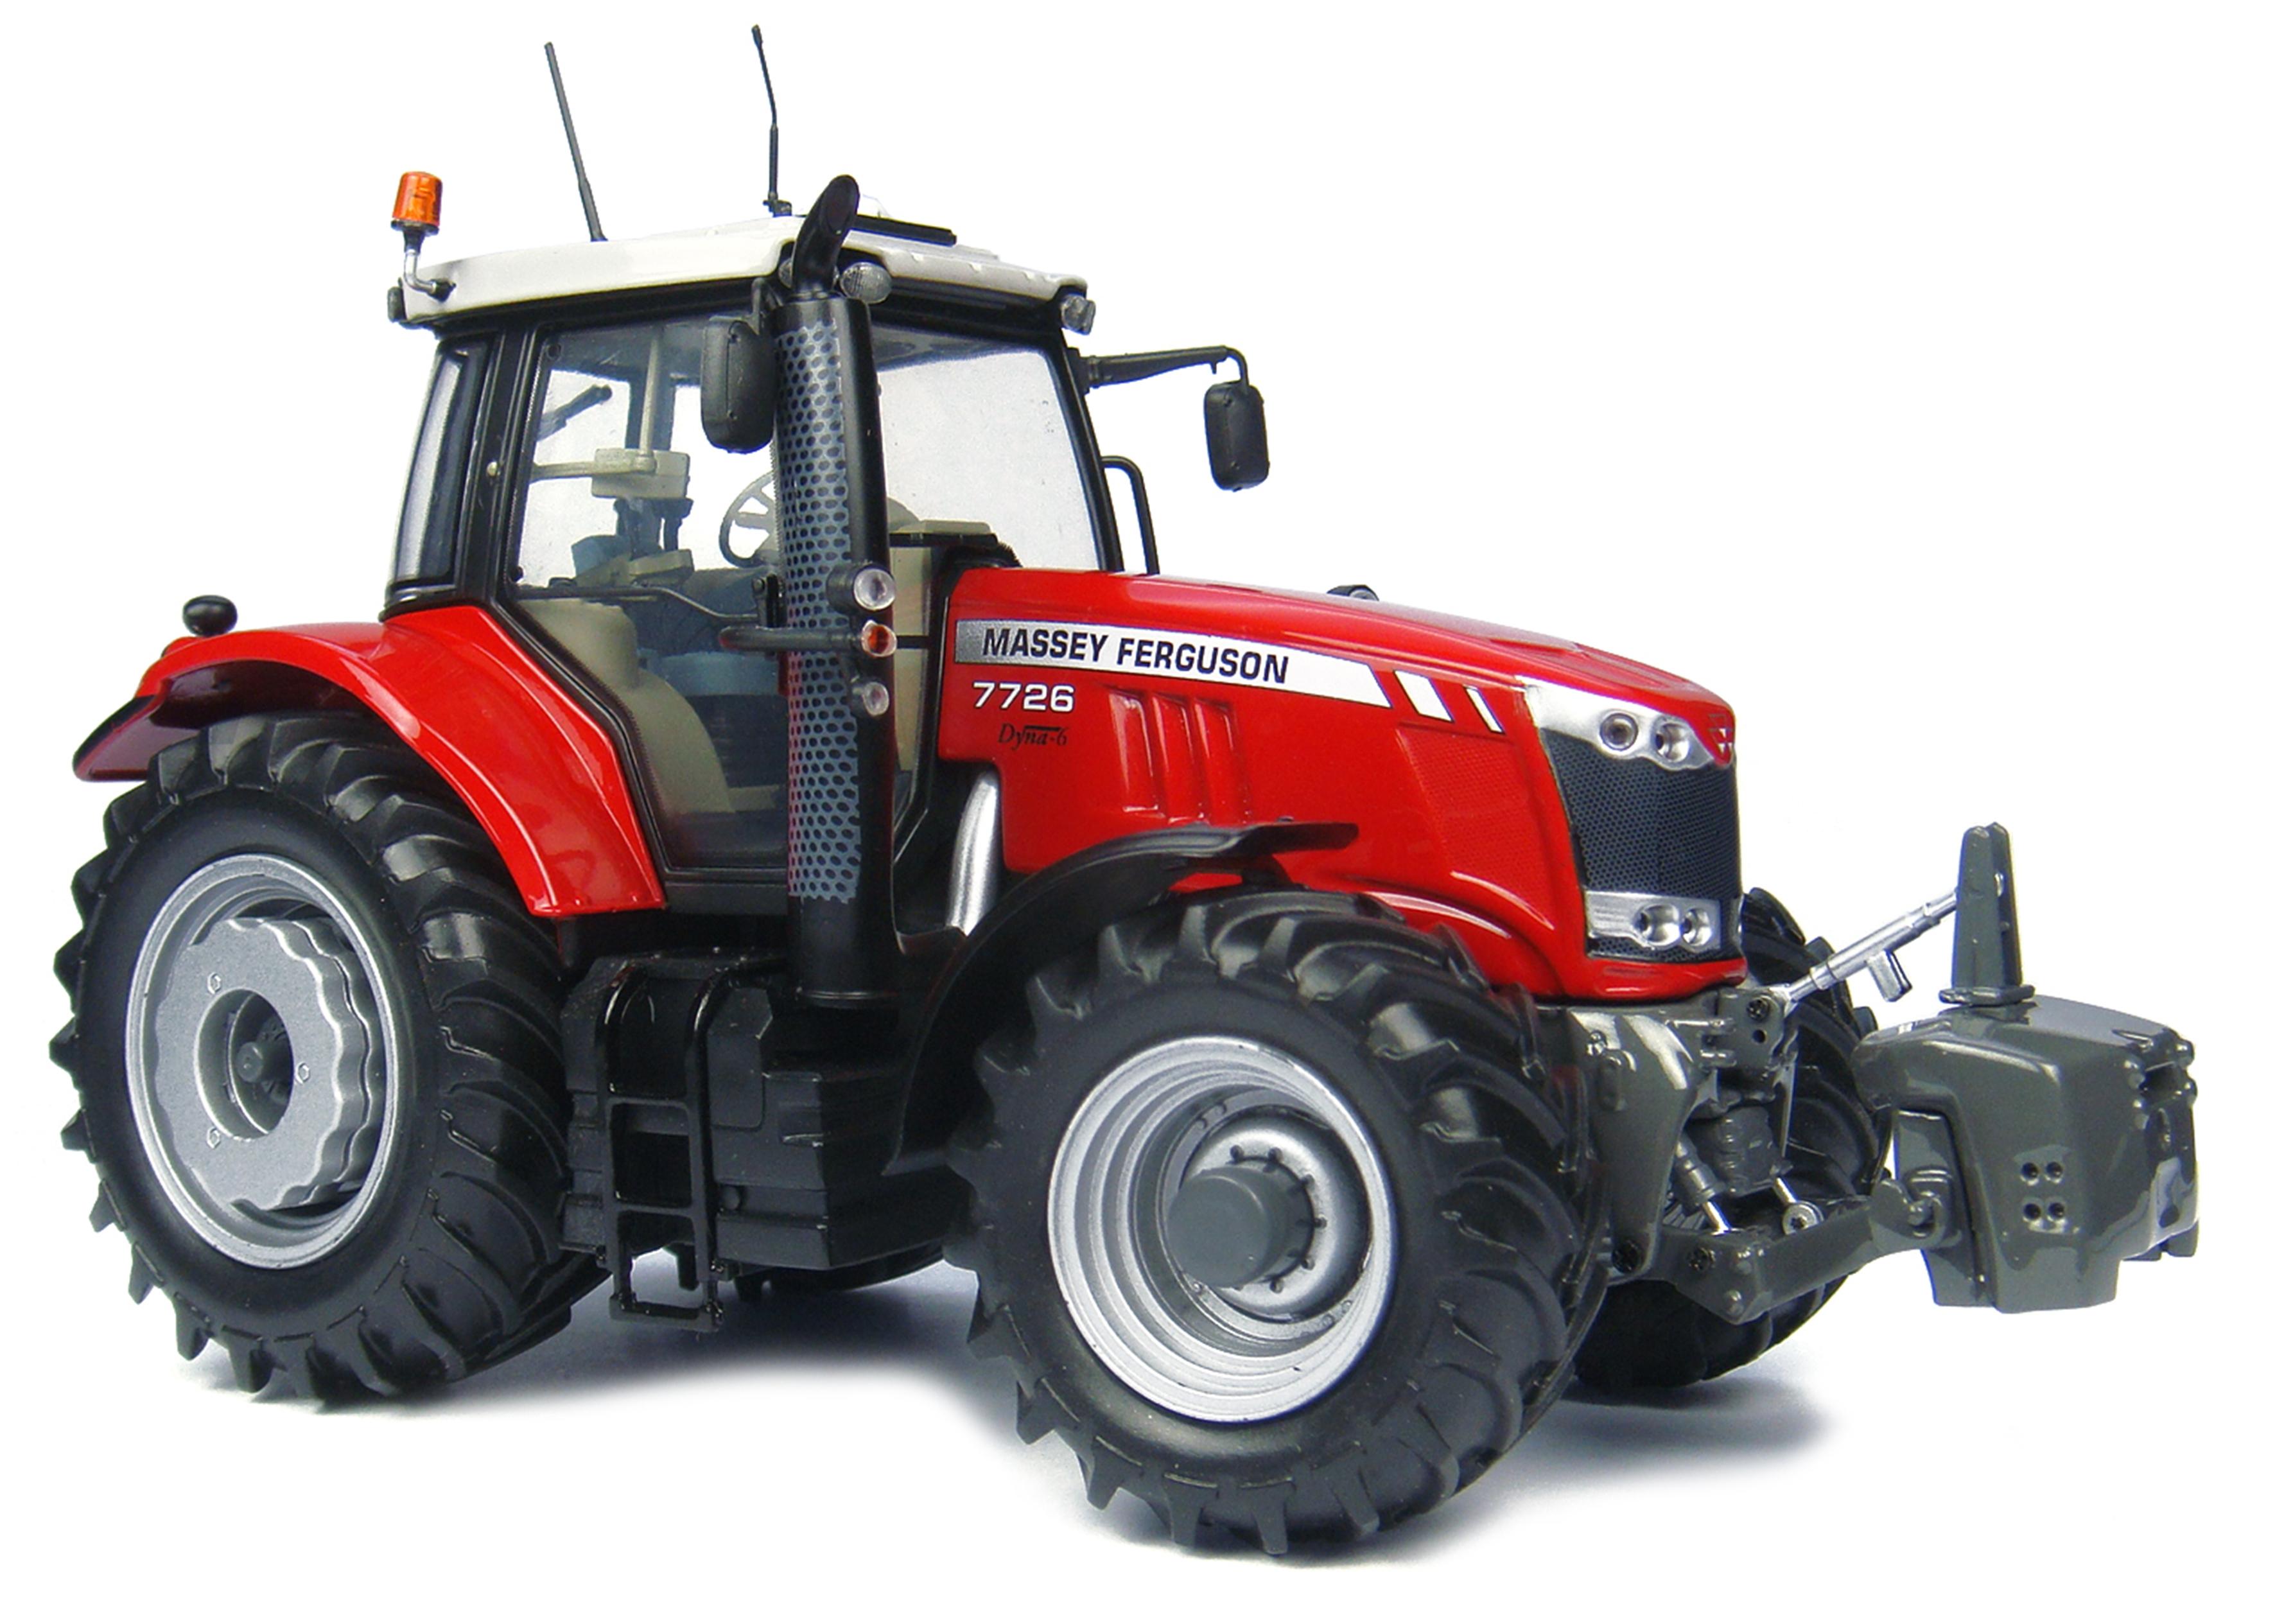 Massey ferguson 7726 2015 fabriqu par universal hobbies echelle 1 32 - Dessin de tracteur massey ferguson ...